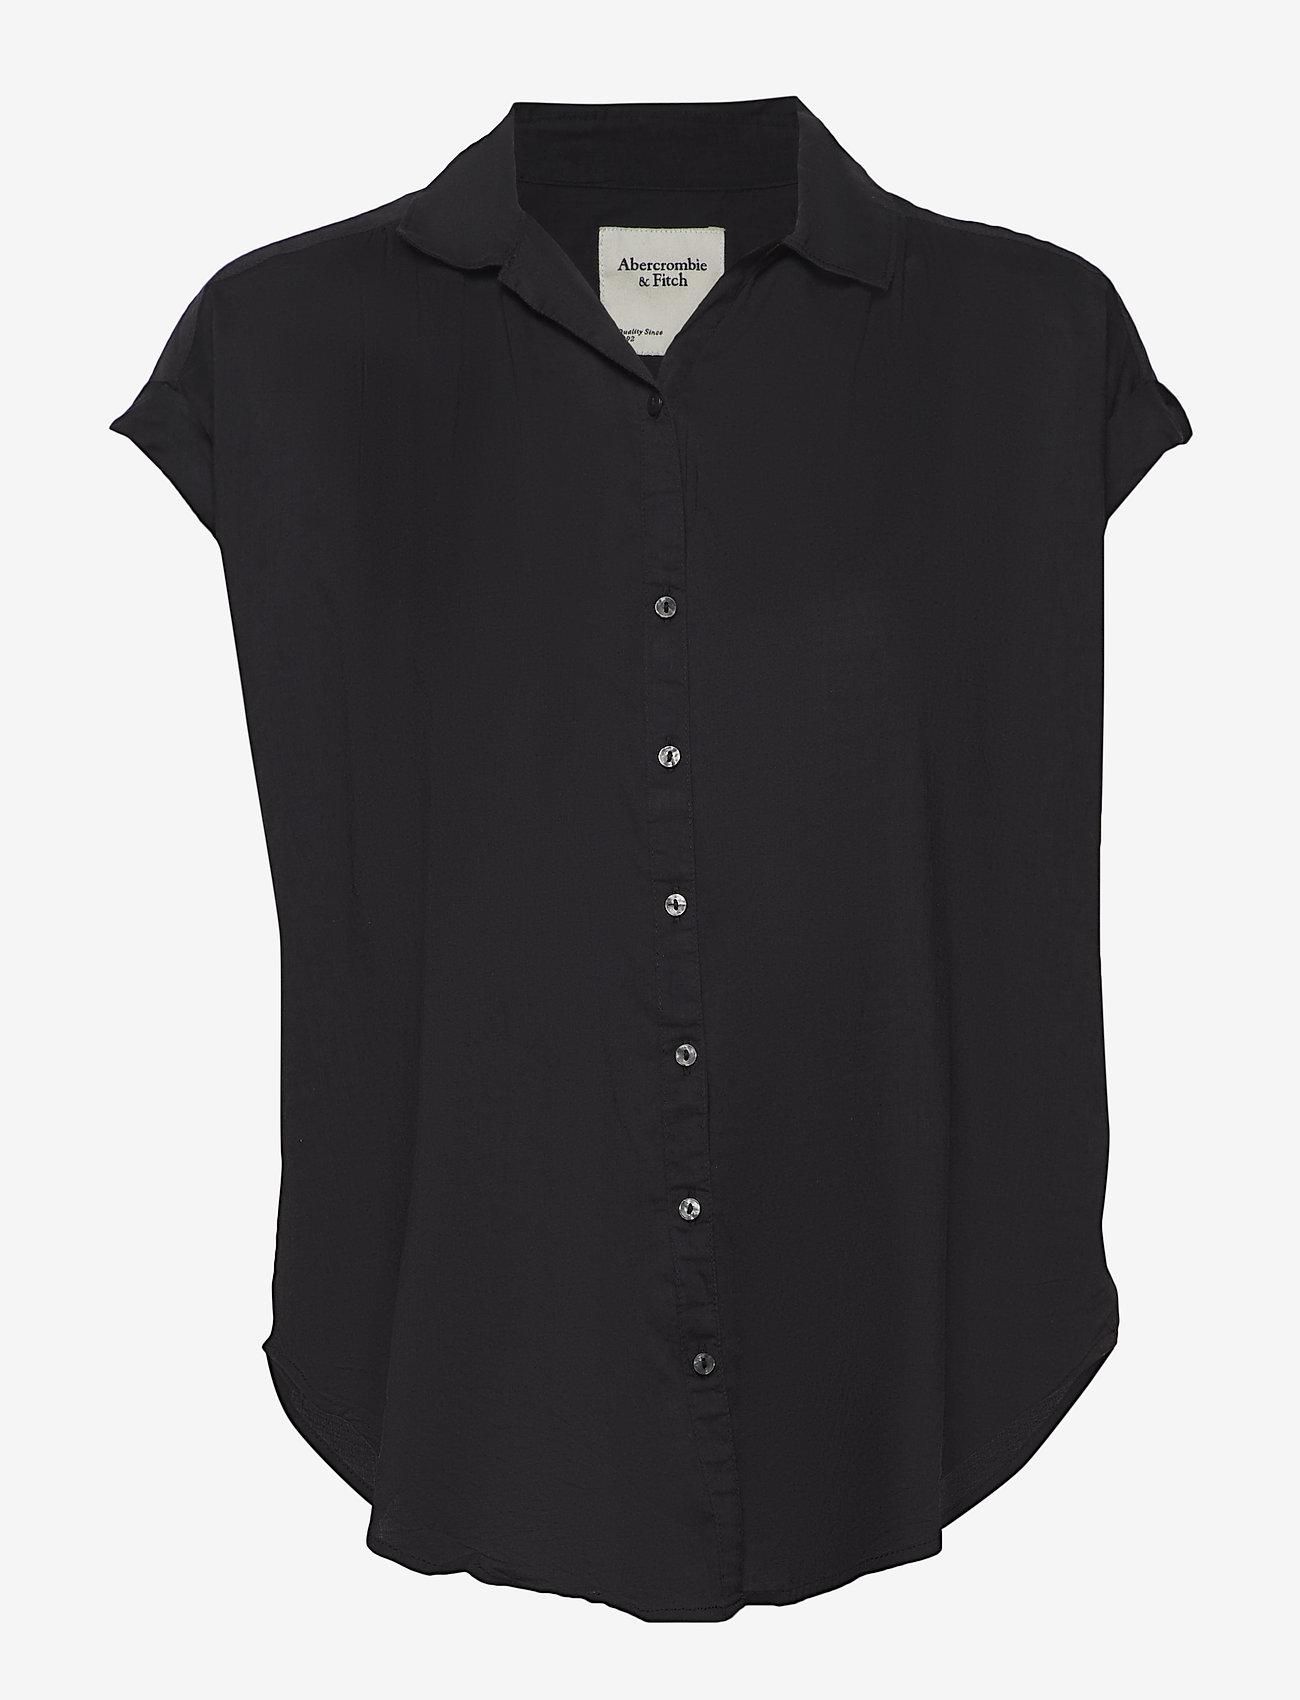 Abercrombie & Fitch - Shirt - overhemden met korte mouwen - black dd - 0